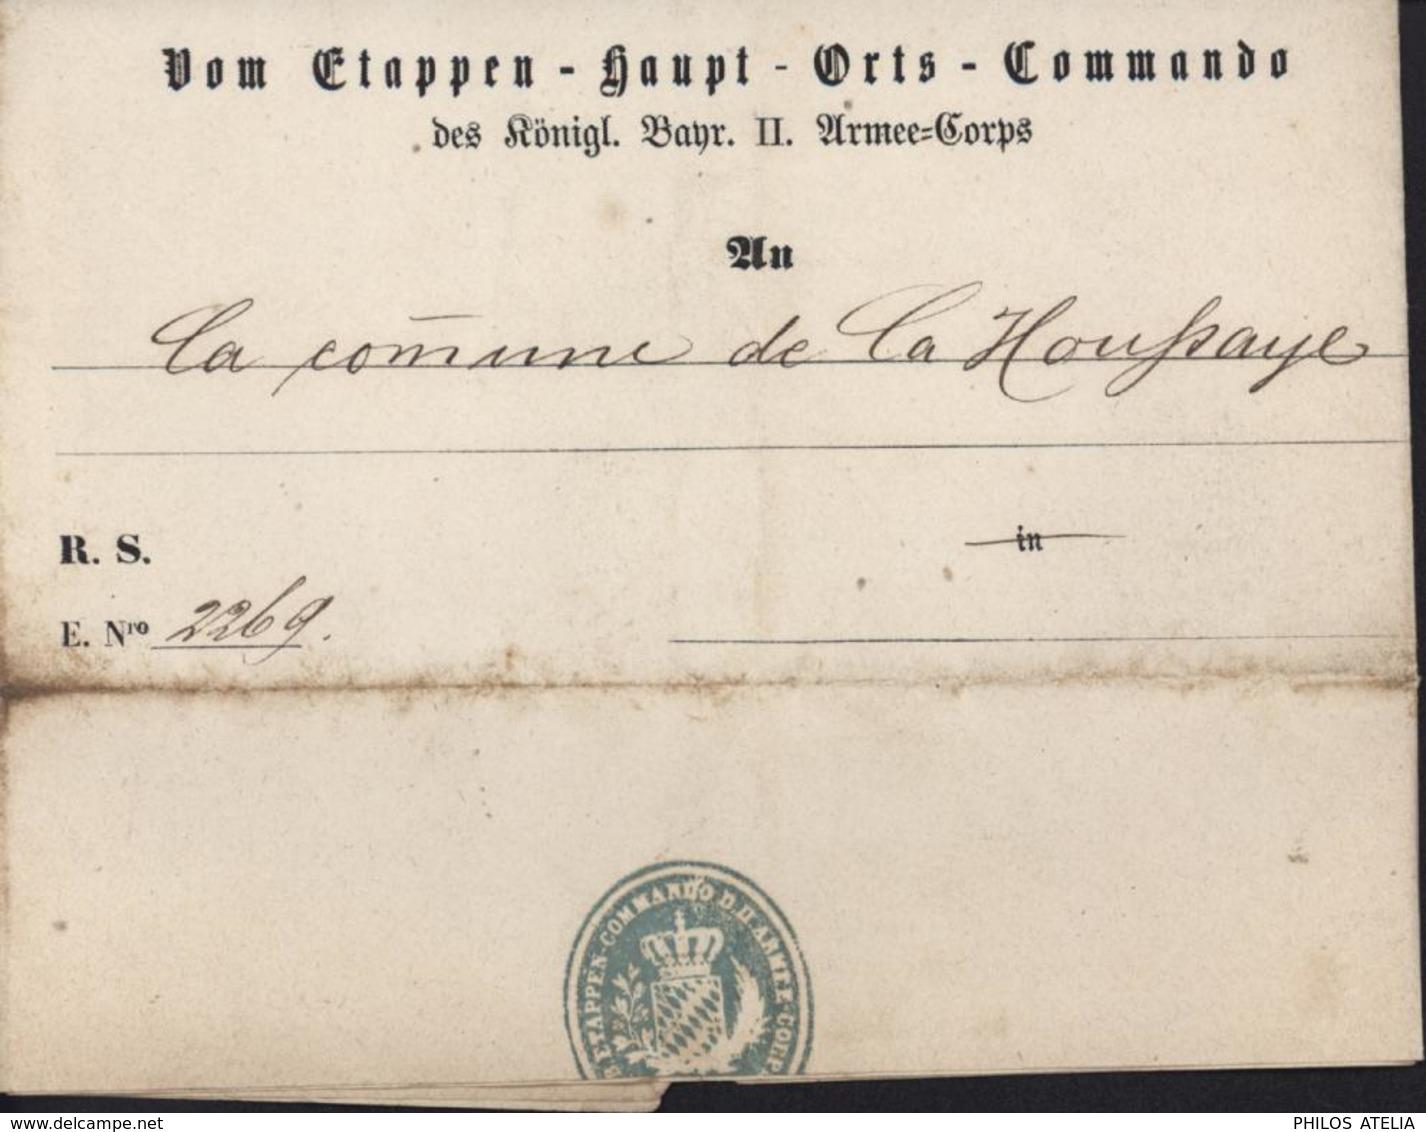 Guerre 1870 Occupation Allemande La Houssaye Eure Vom Etappen Haupt Orts Commando Konigl Bahr II Armee Corps Feldpost - War 1870